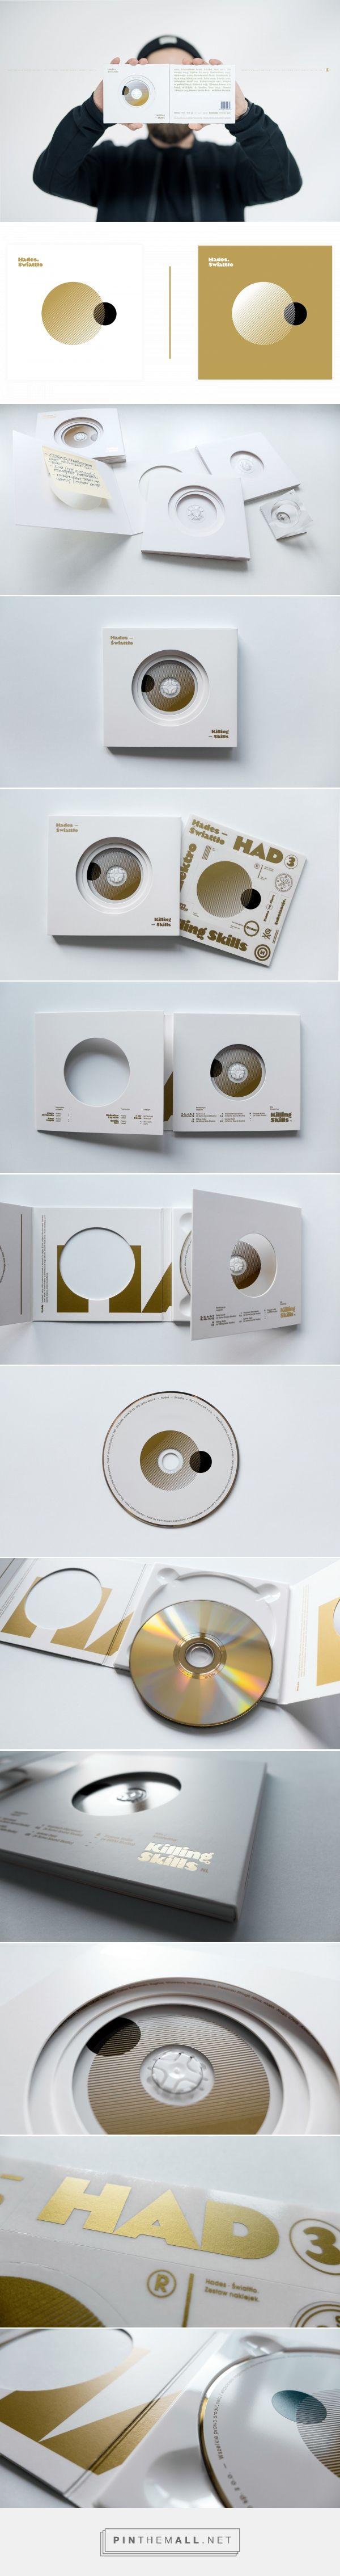 Hades - Świattło / CD Packaging - Packaging of the World - Creative Package Design Gallery - http://www.packagingoftheworld.com/2017/02/hades-swiatto-cd-packaging.html